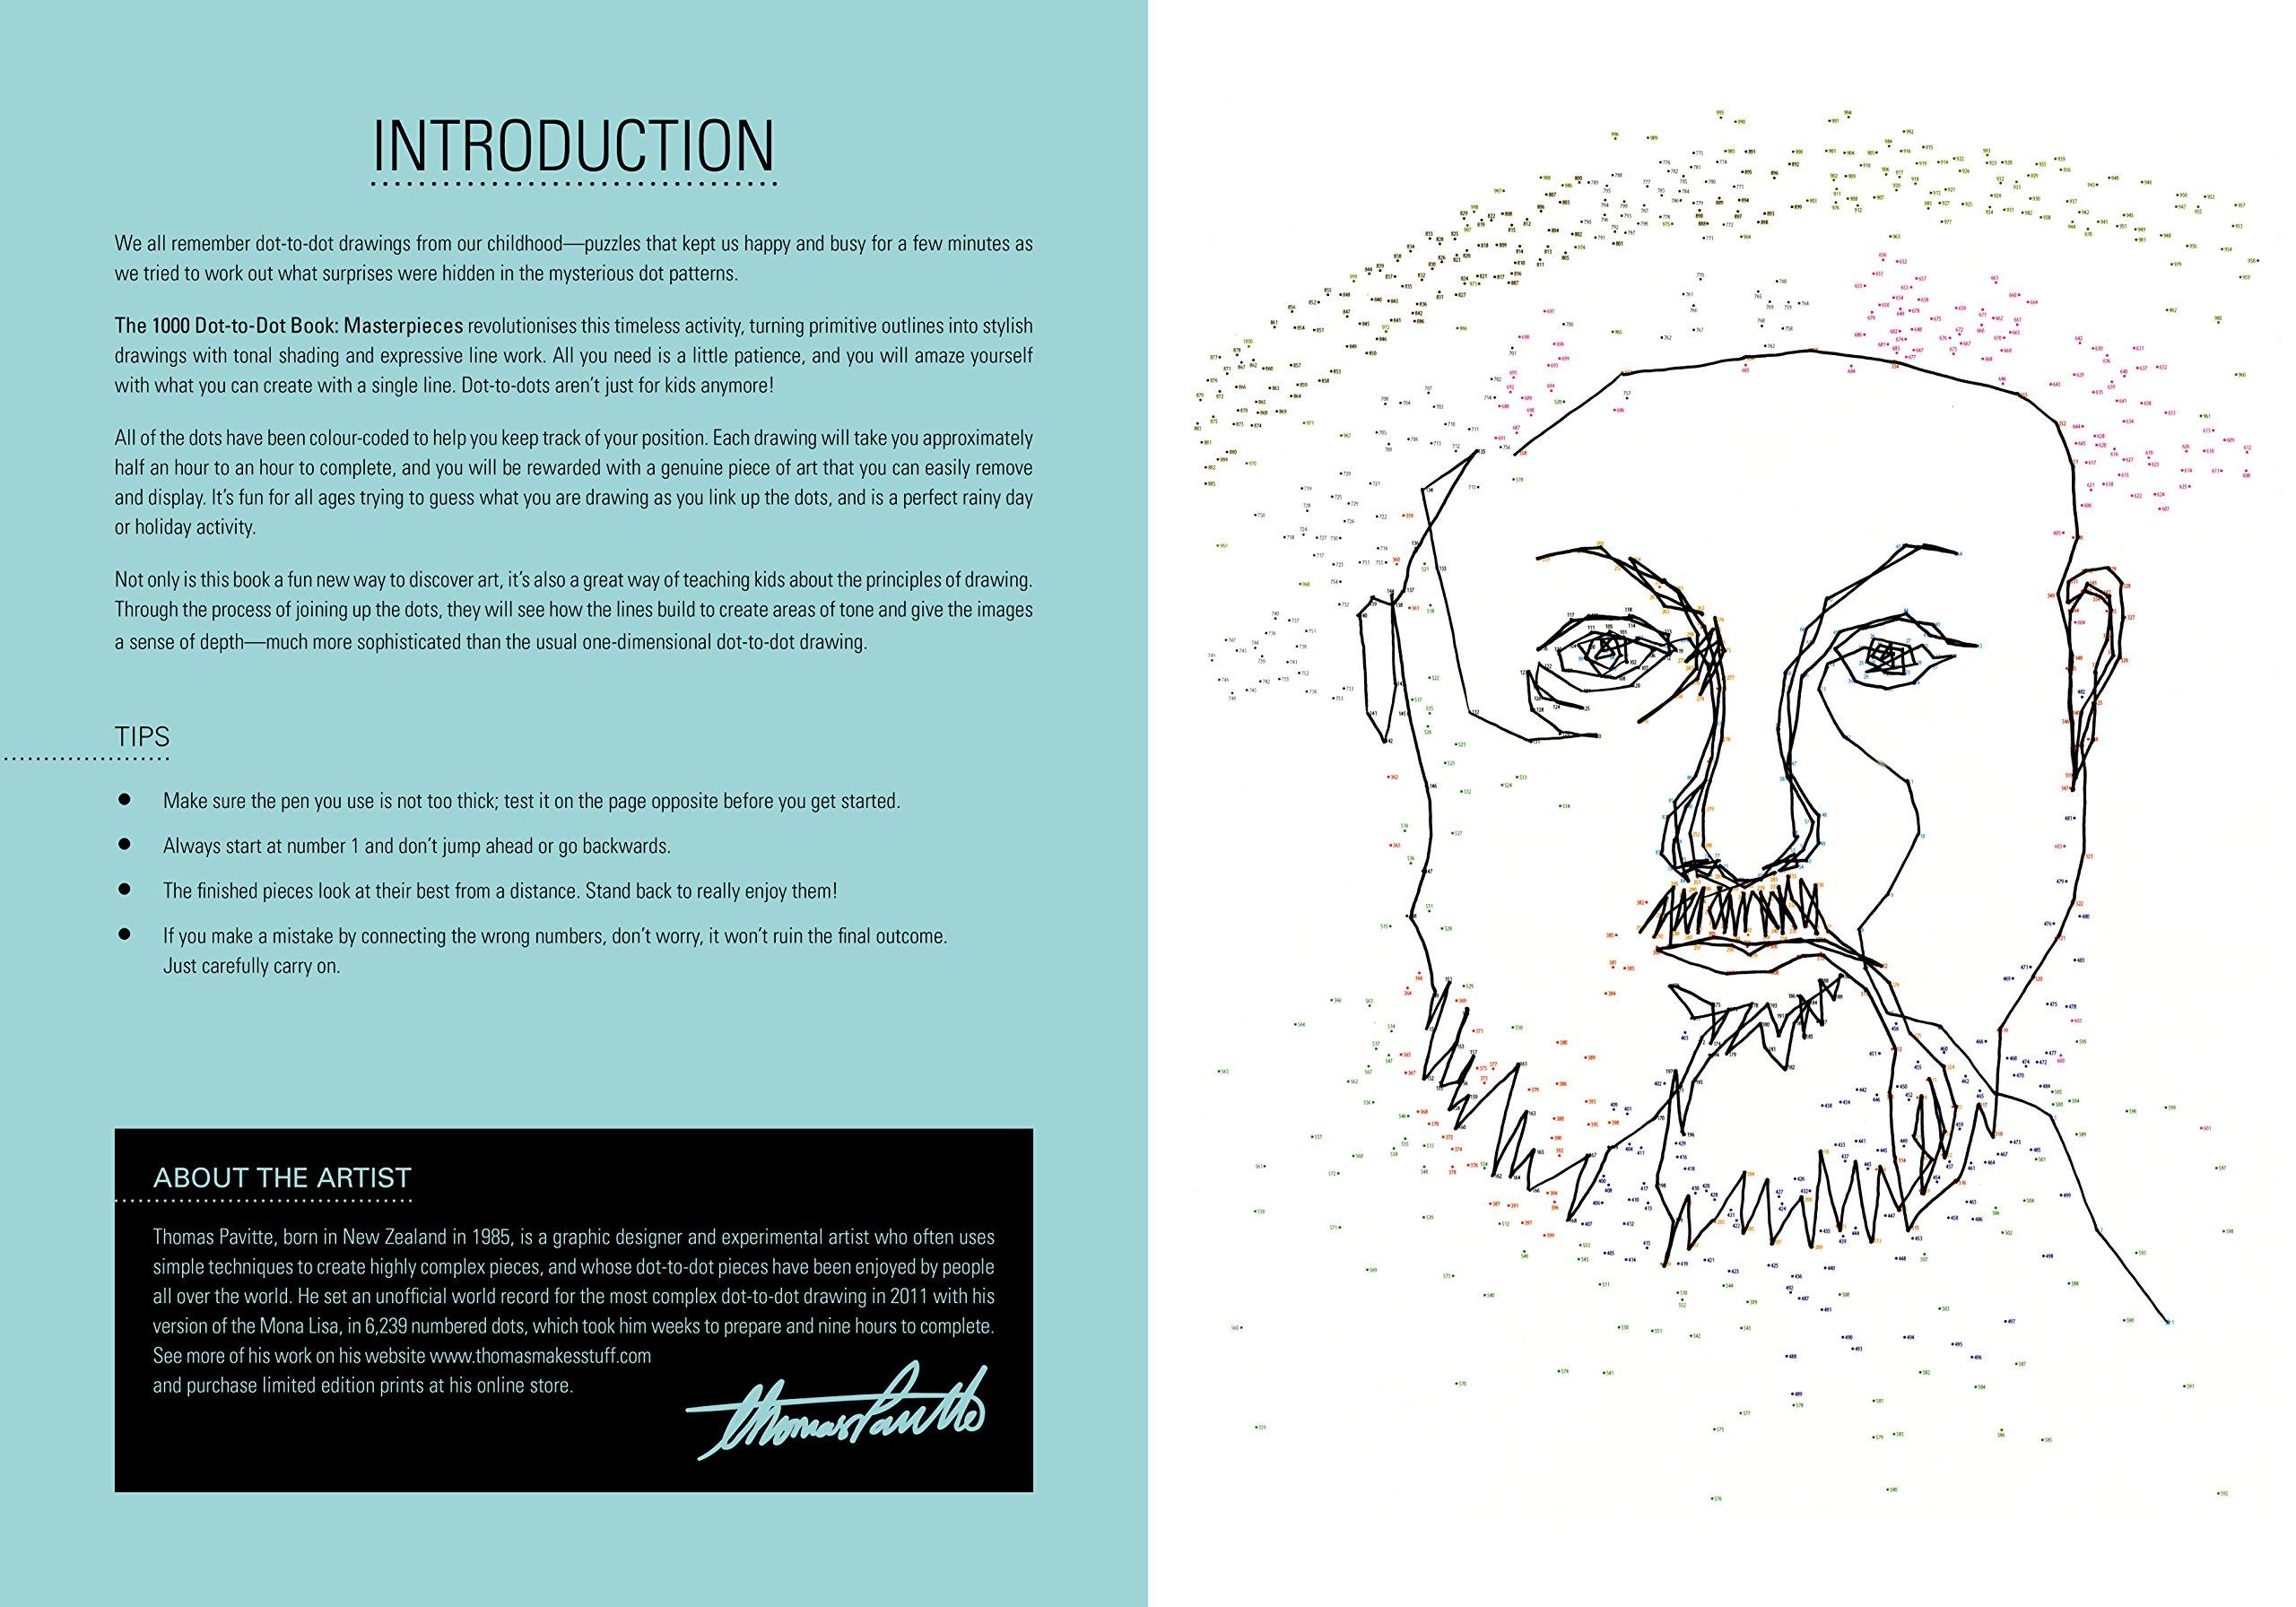 amazon com the 1000 dot to dot book masterpieces ilex art